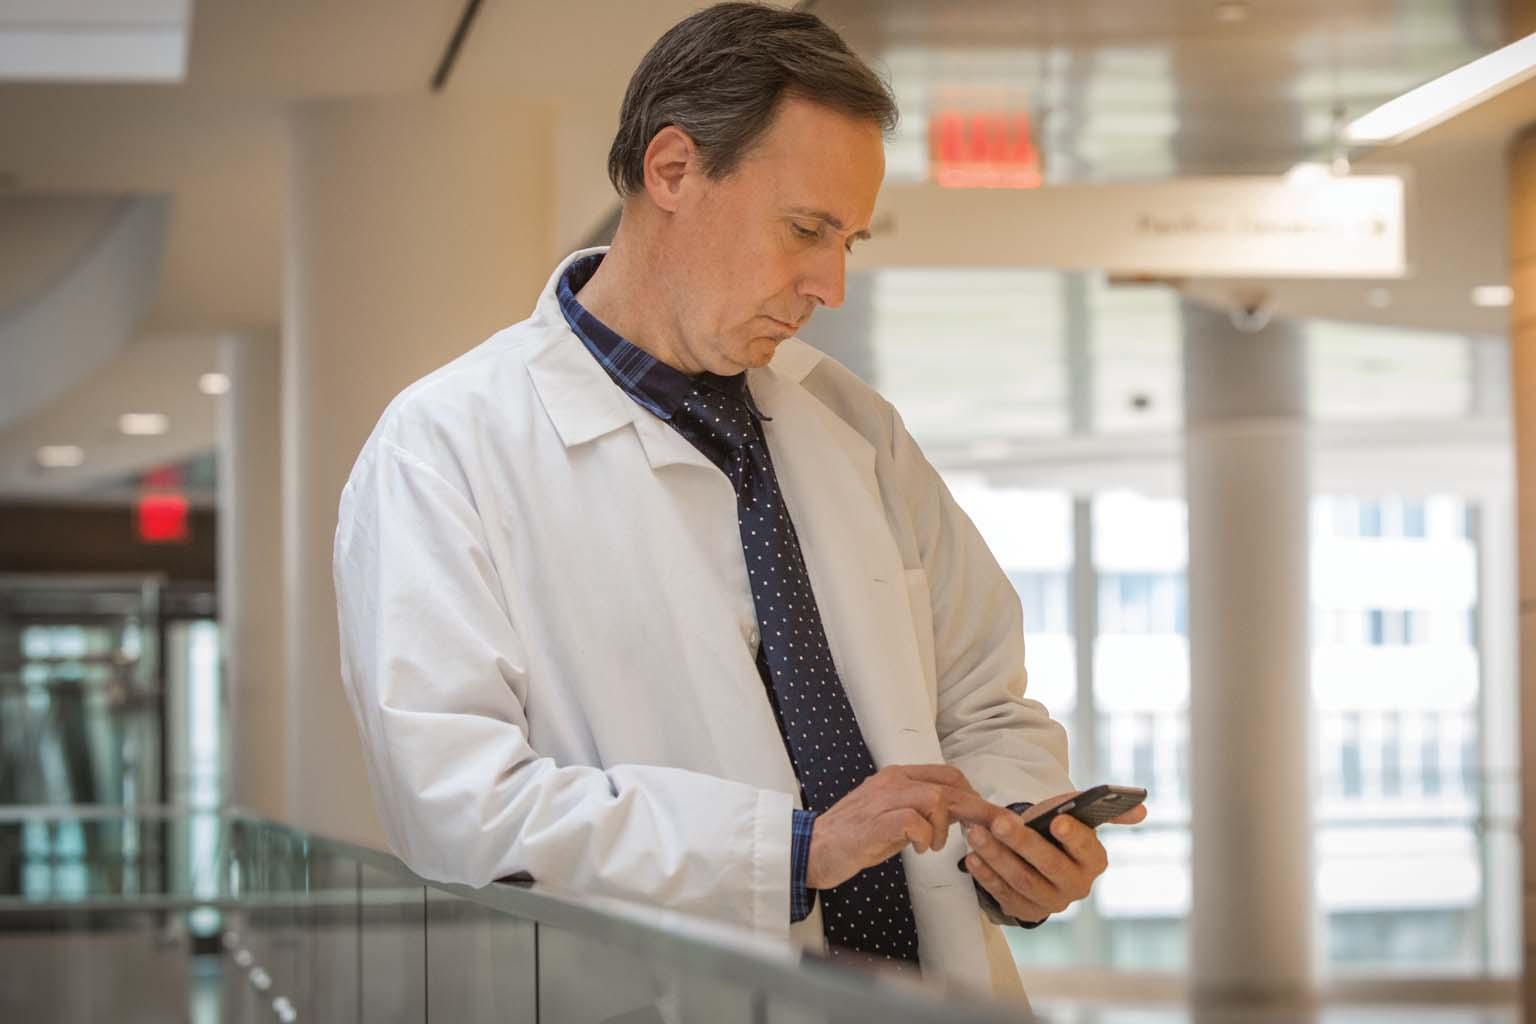 doctor paused in hallway looking at smartphone